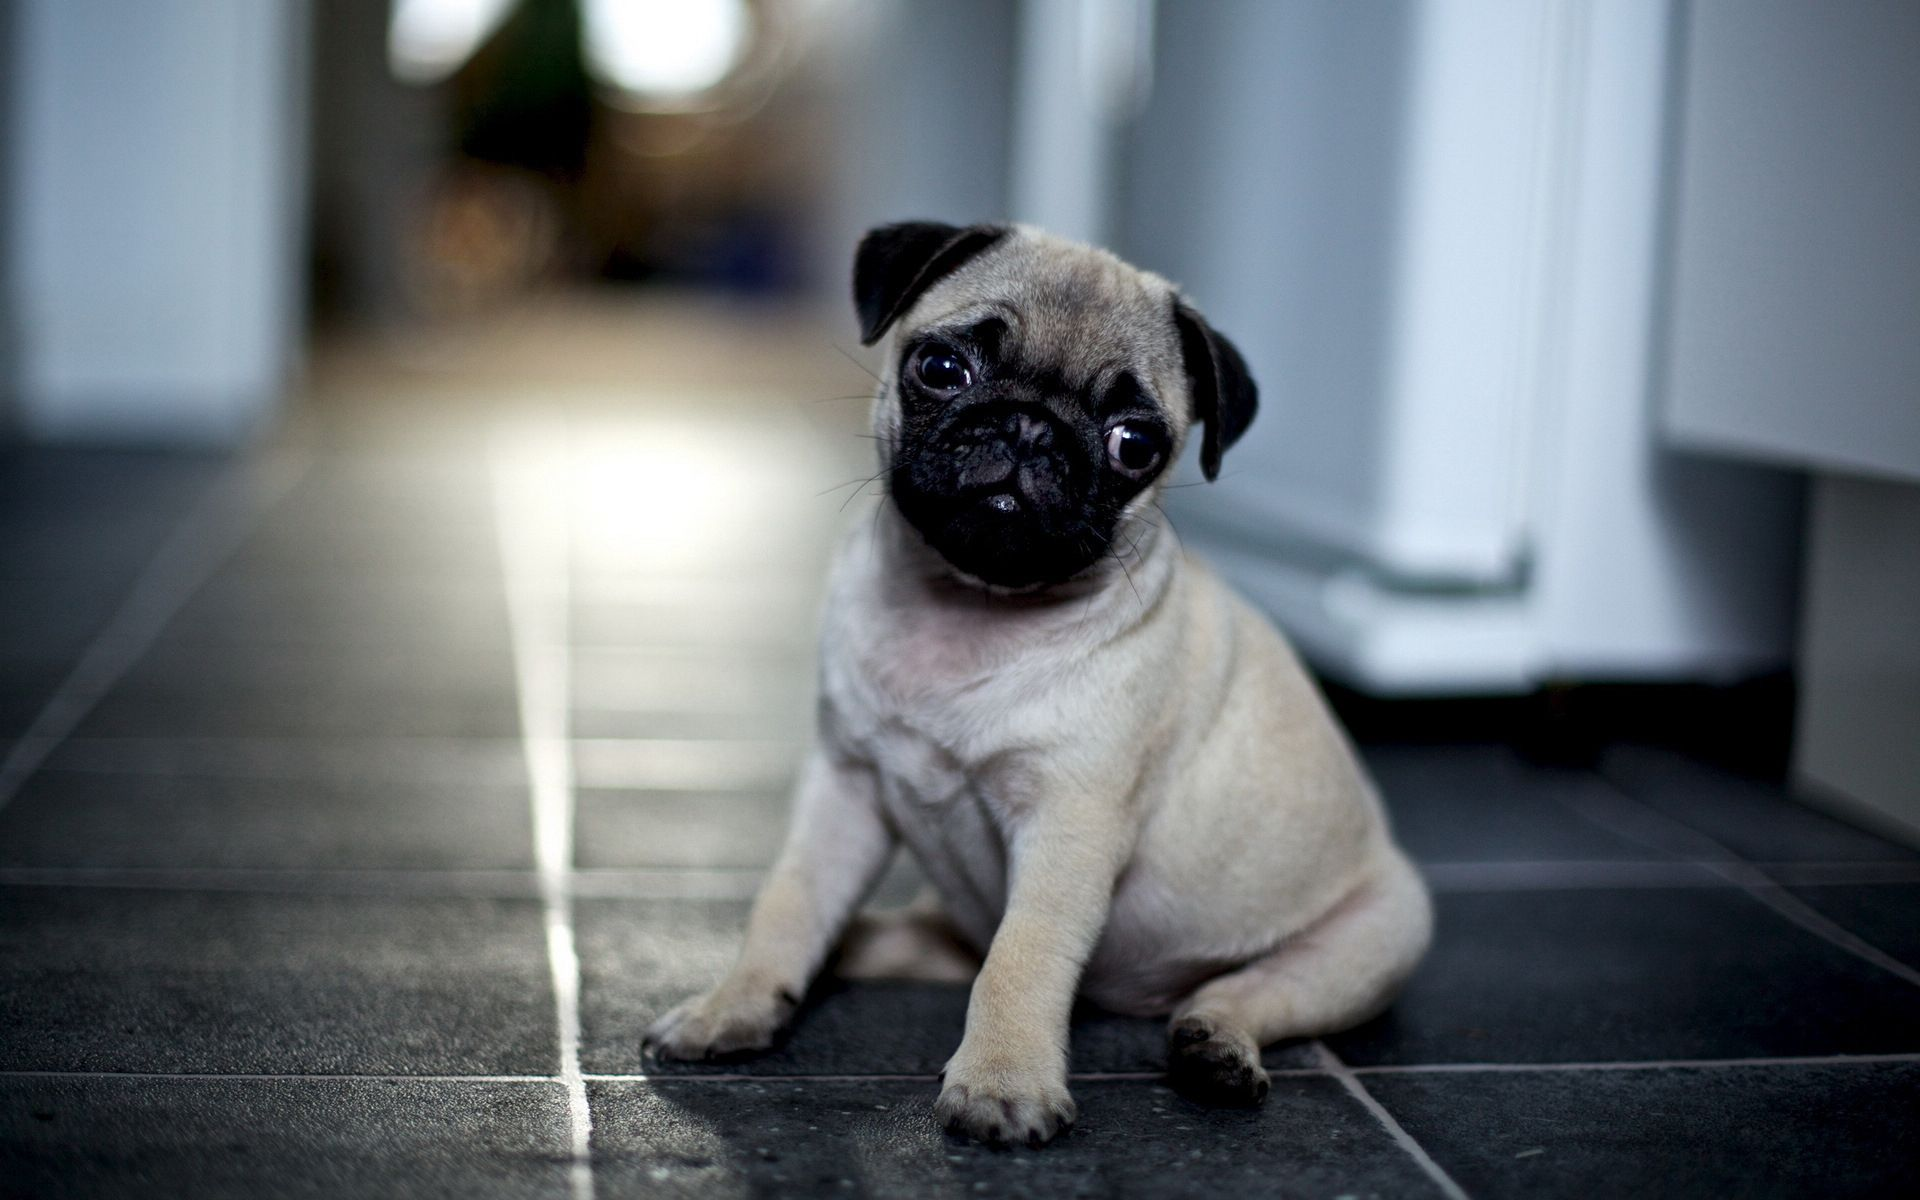 Cute Pug Puppy Wallpaper Screensaver Background Cute Pugs Pugs Baby Pugs